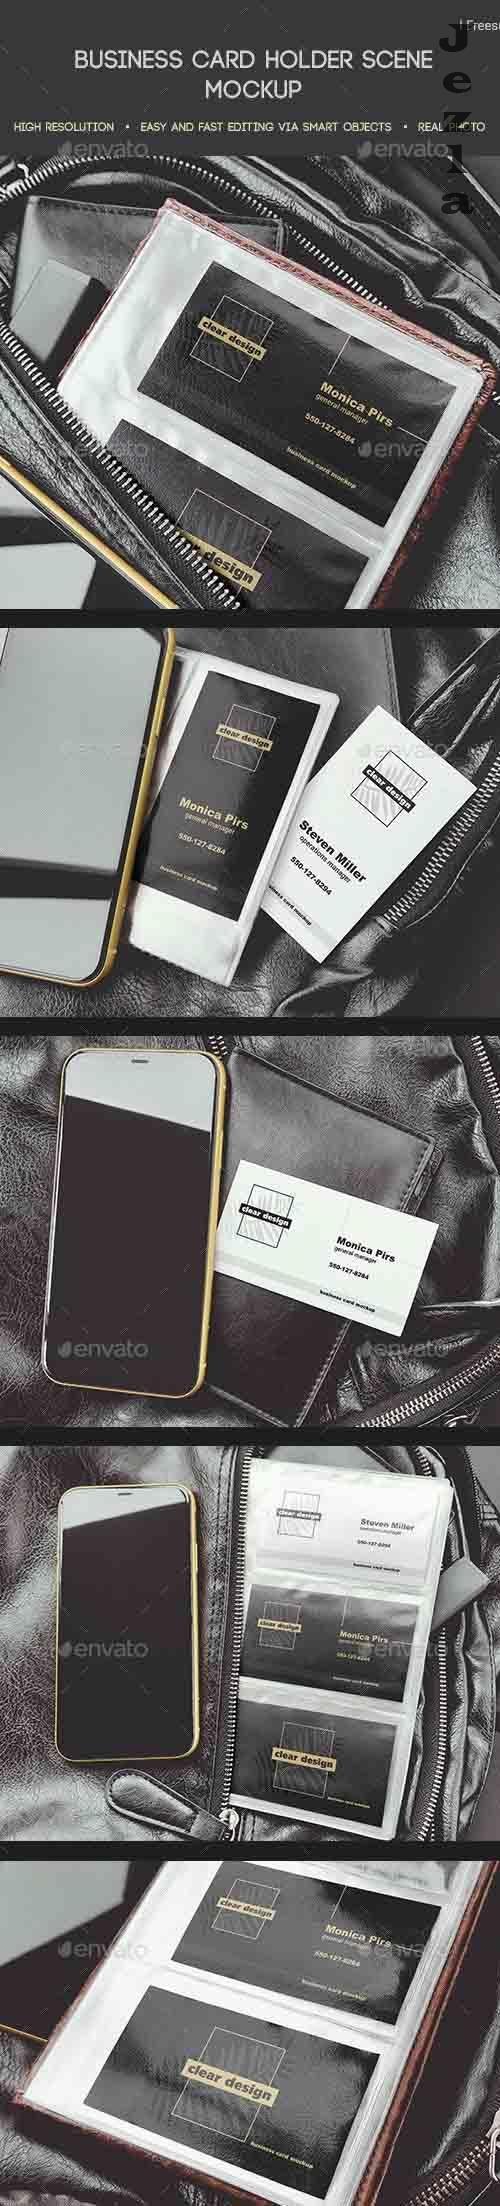 Business Card Holder Scene Mockup 25780069